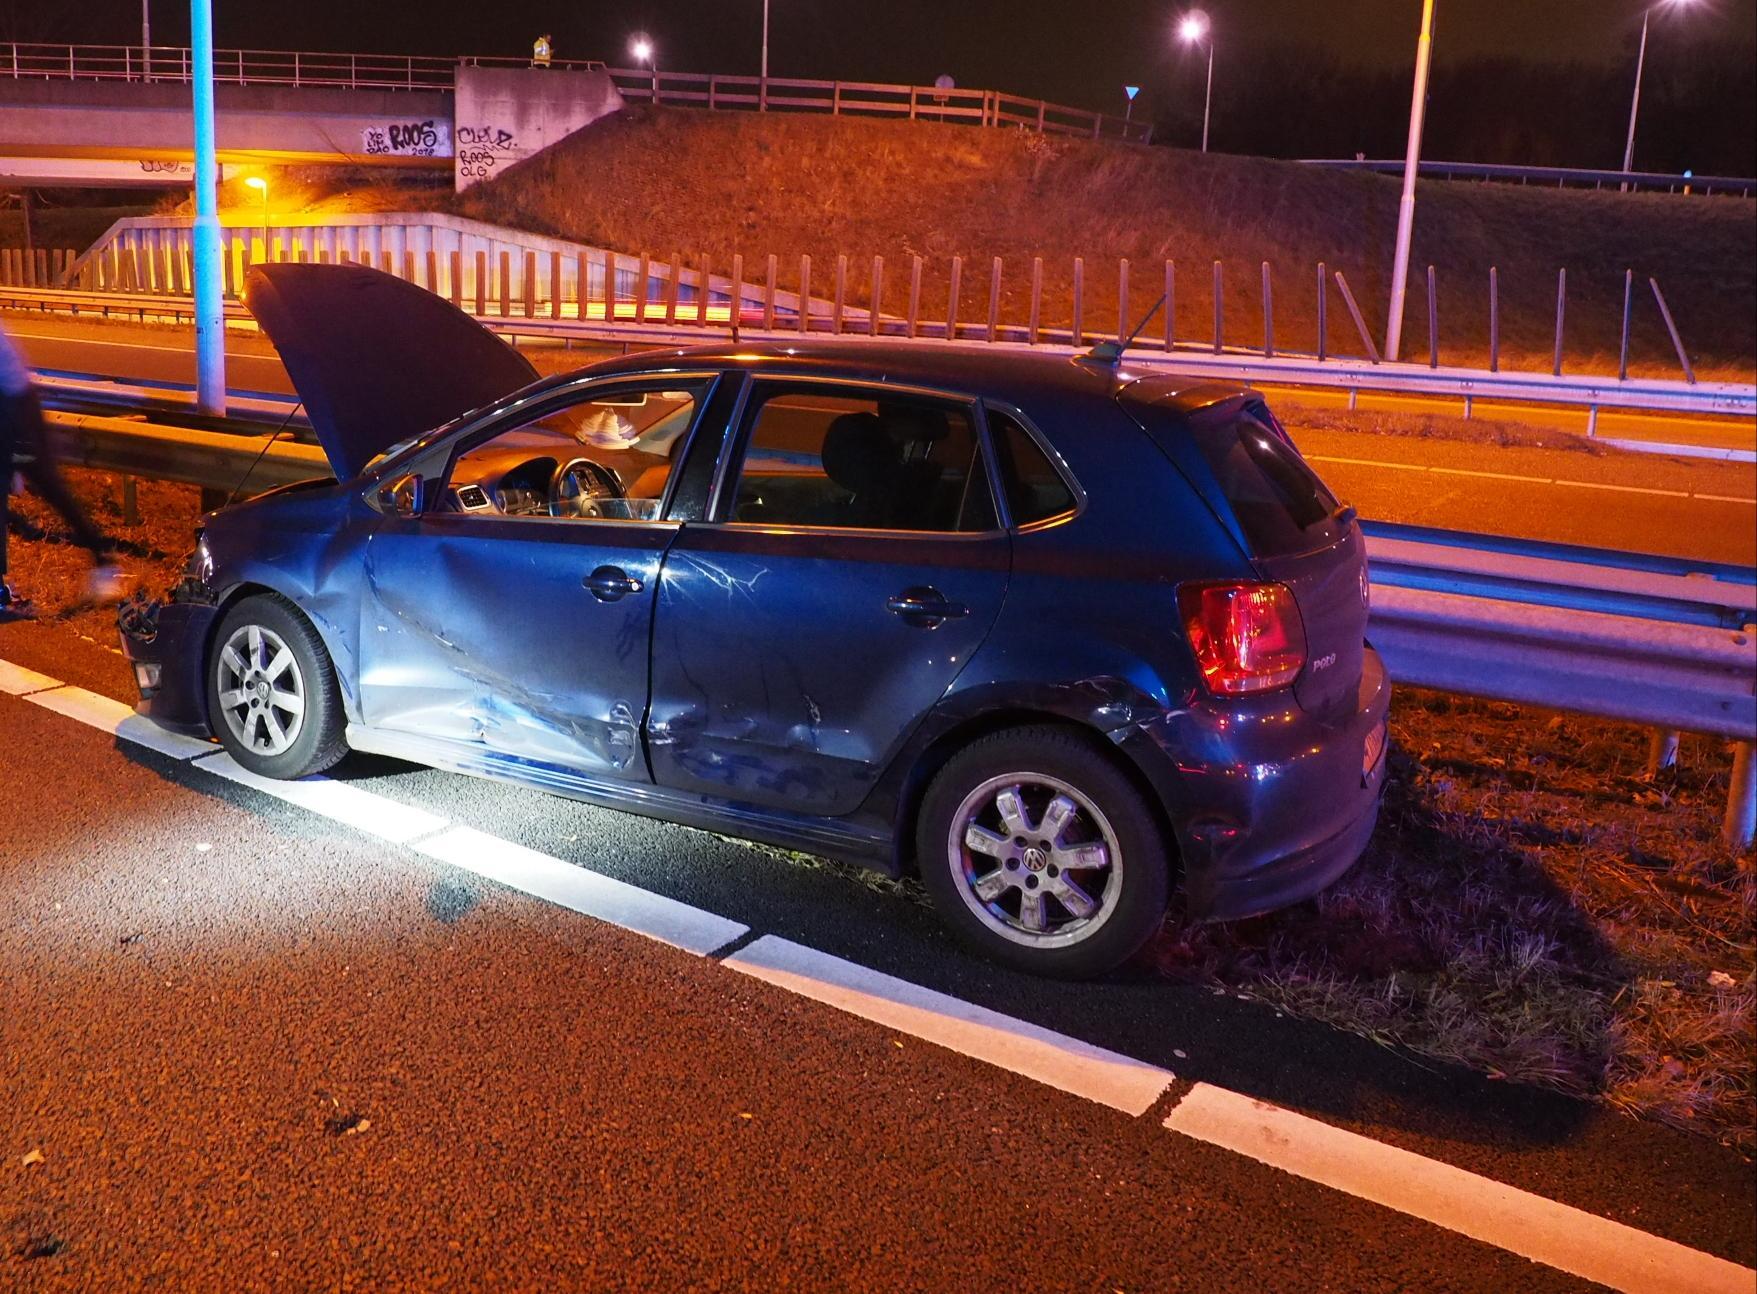 Flinke schade bij ongeluk A208 in Velsen-Zuid